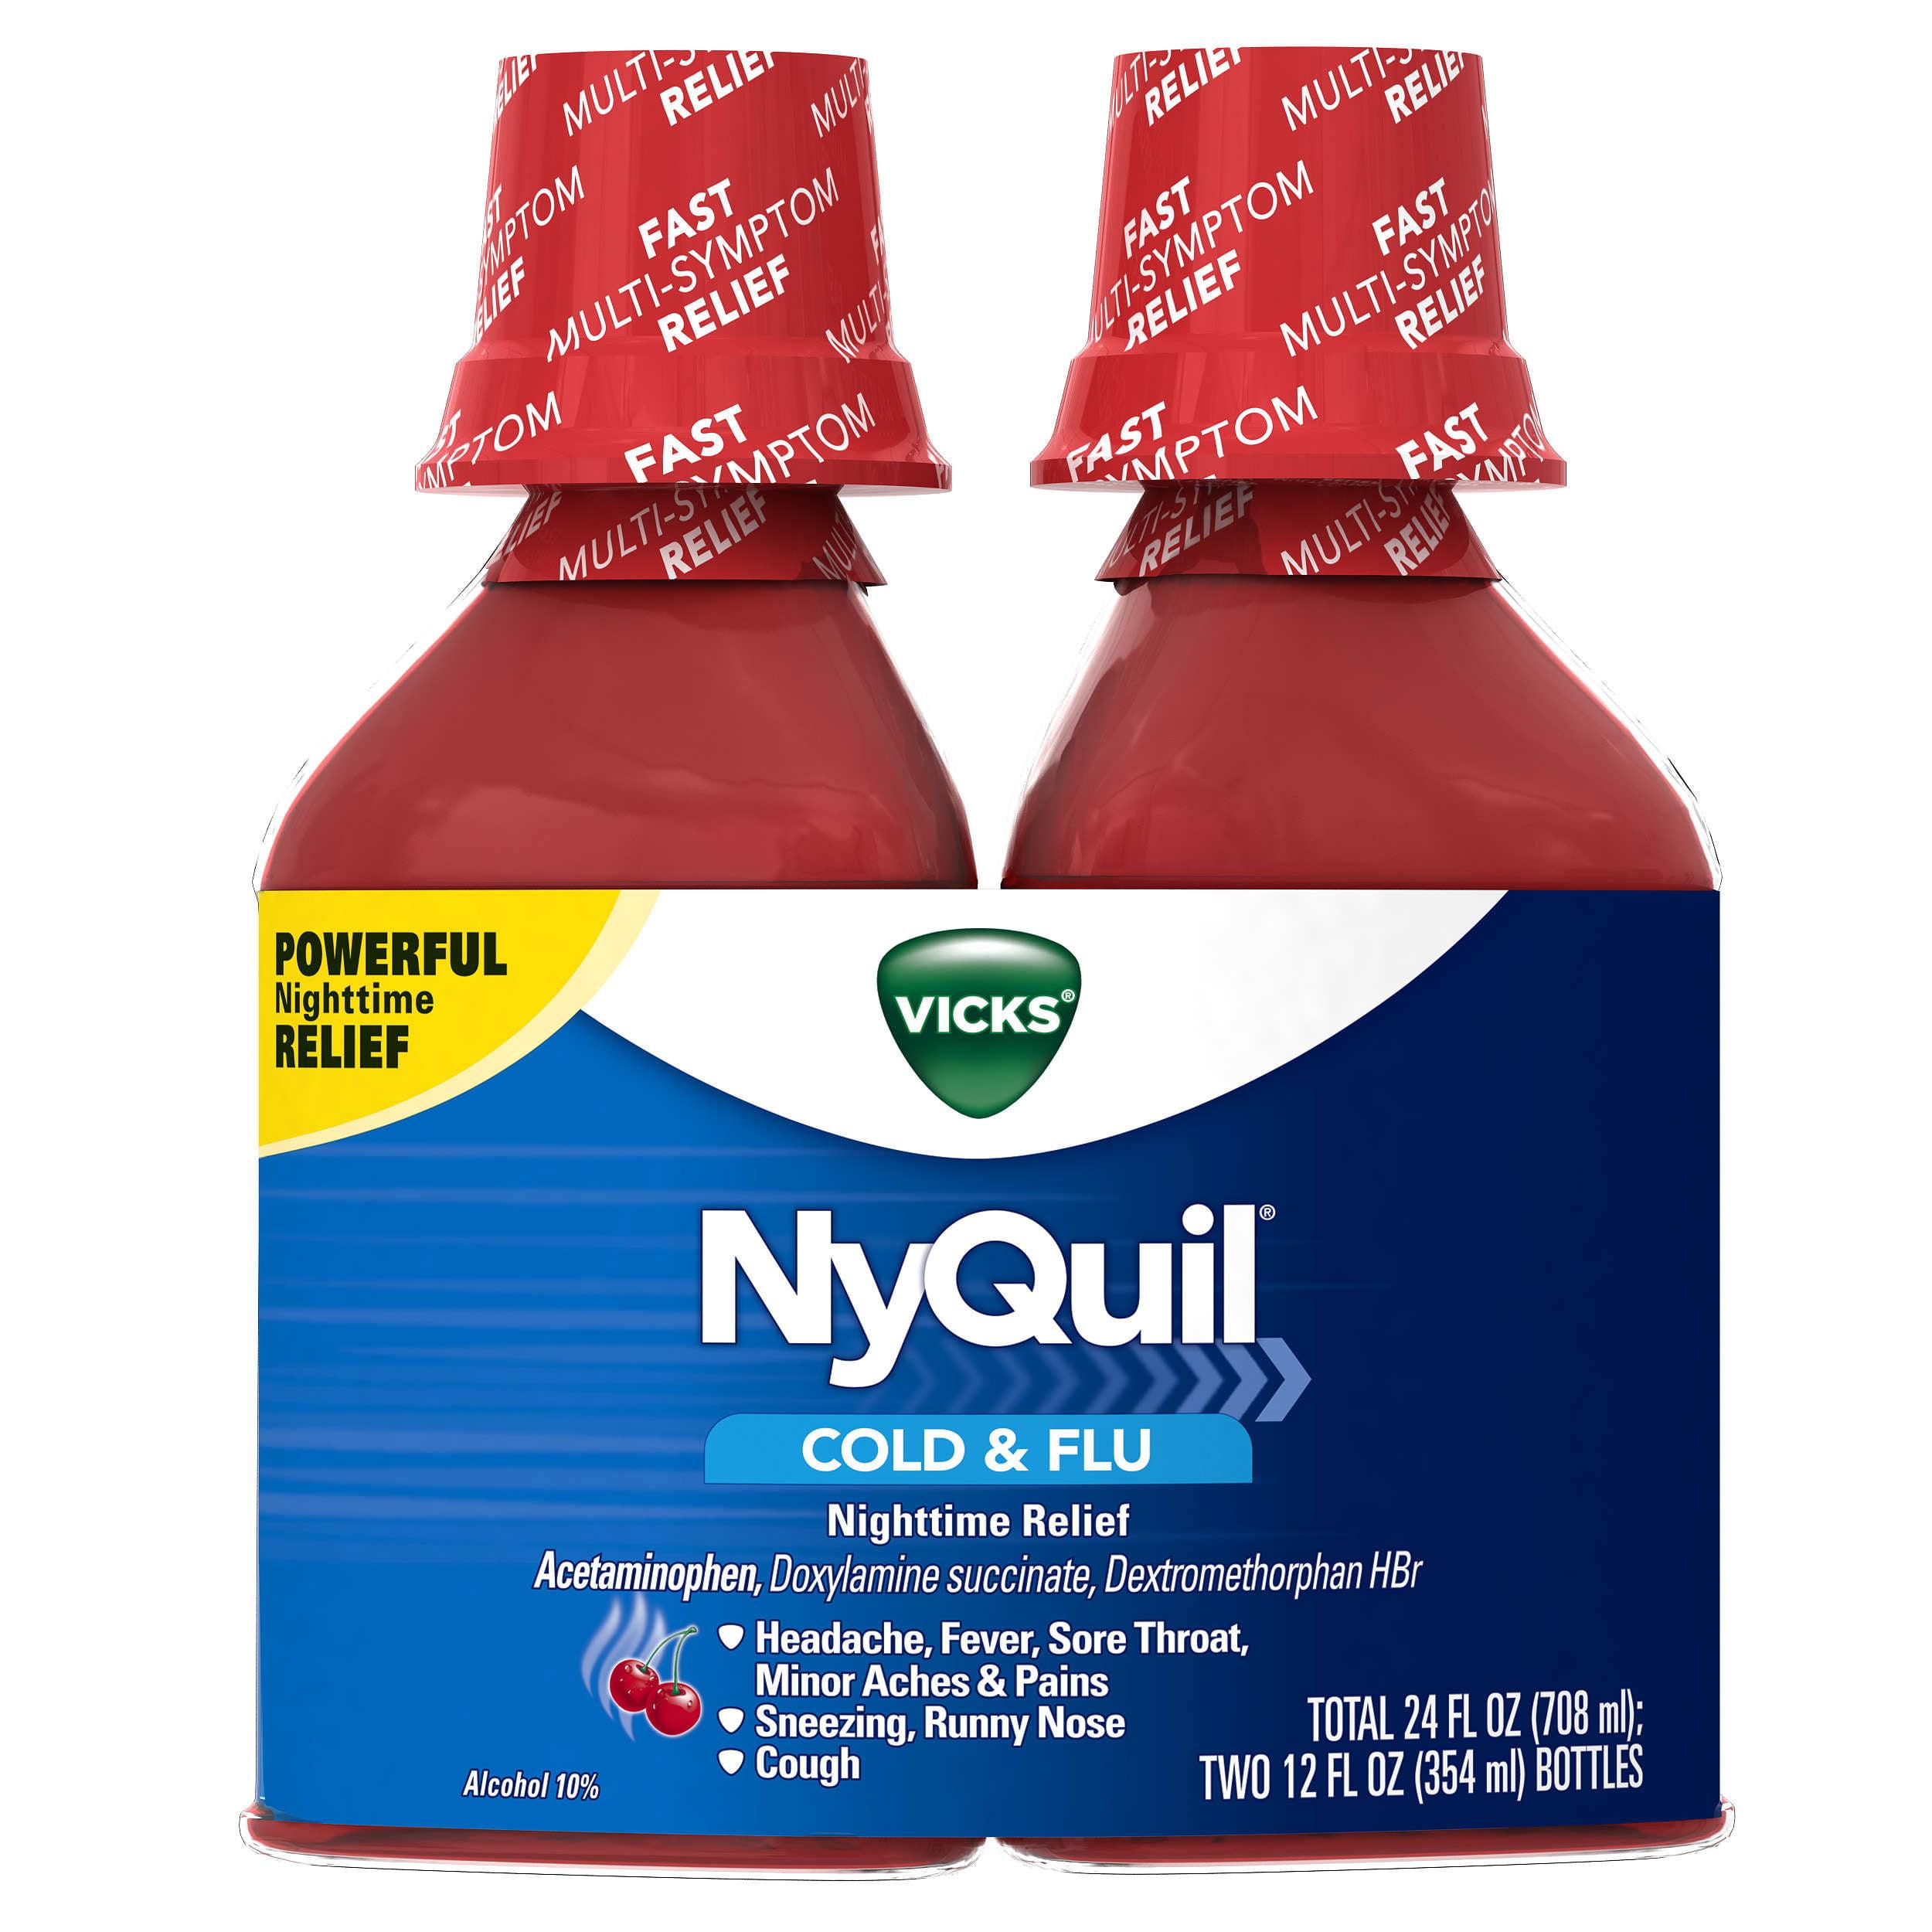 Vicks NyQuil Cold & Flu Nighttime Relief Cherry Flavor Liquid 2 x 12 fl oz